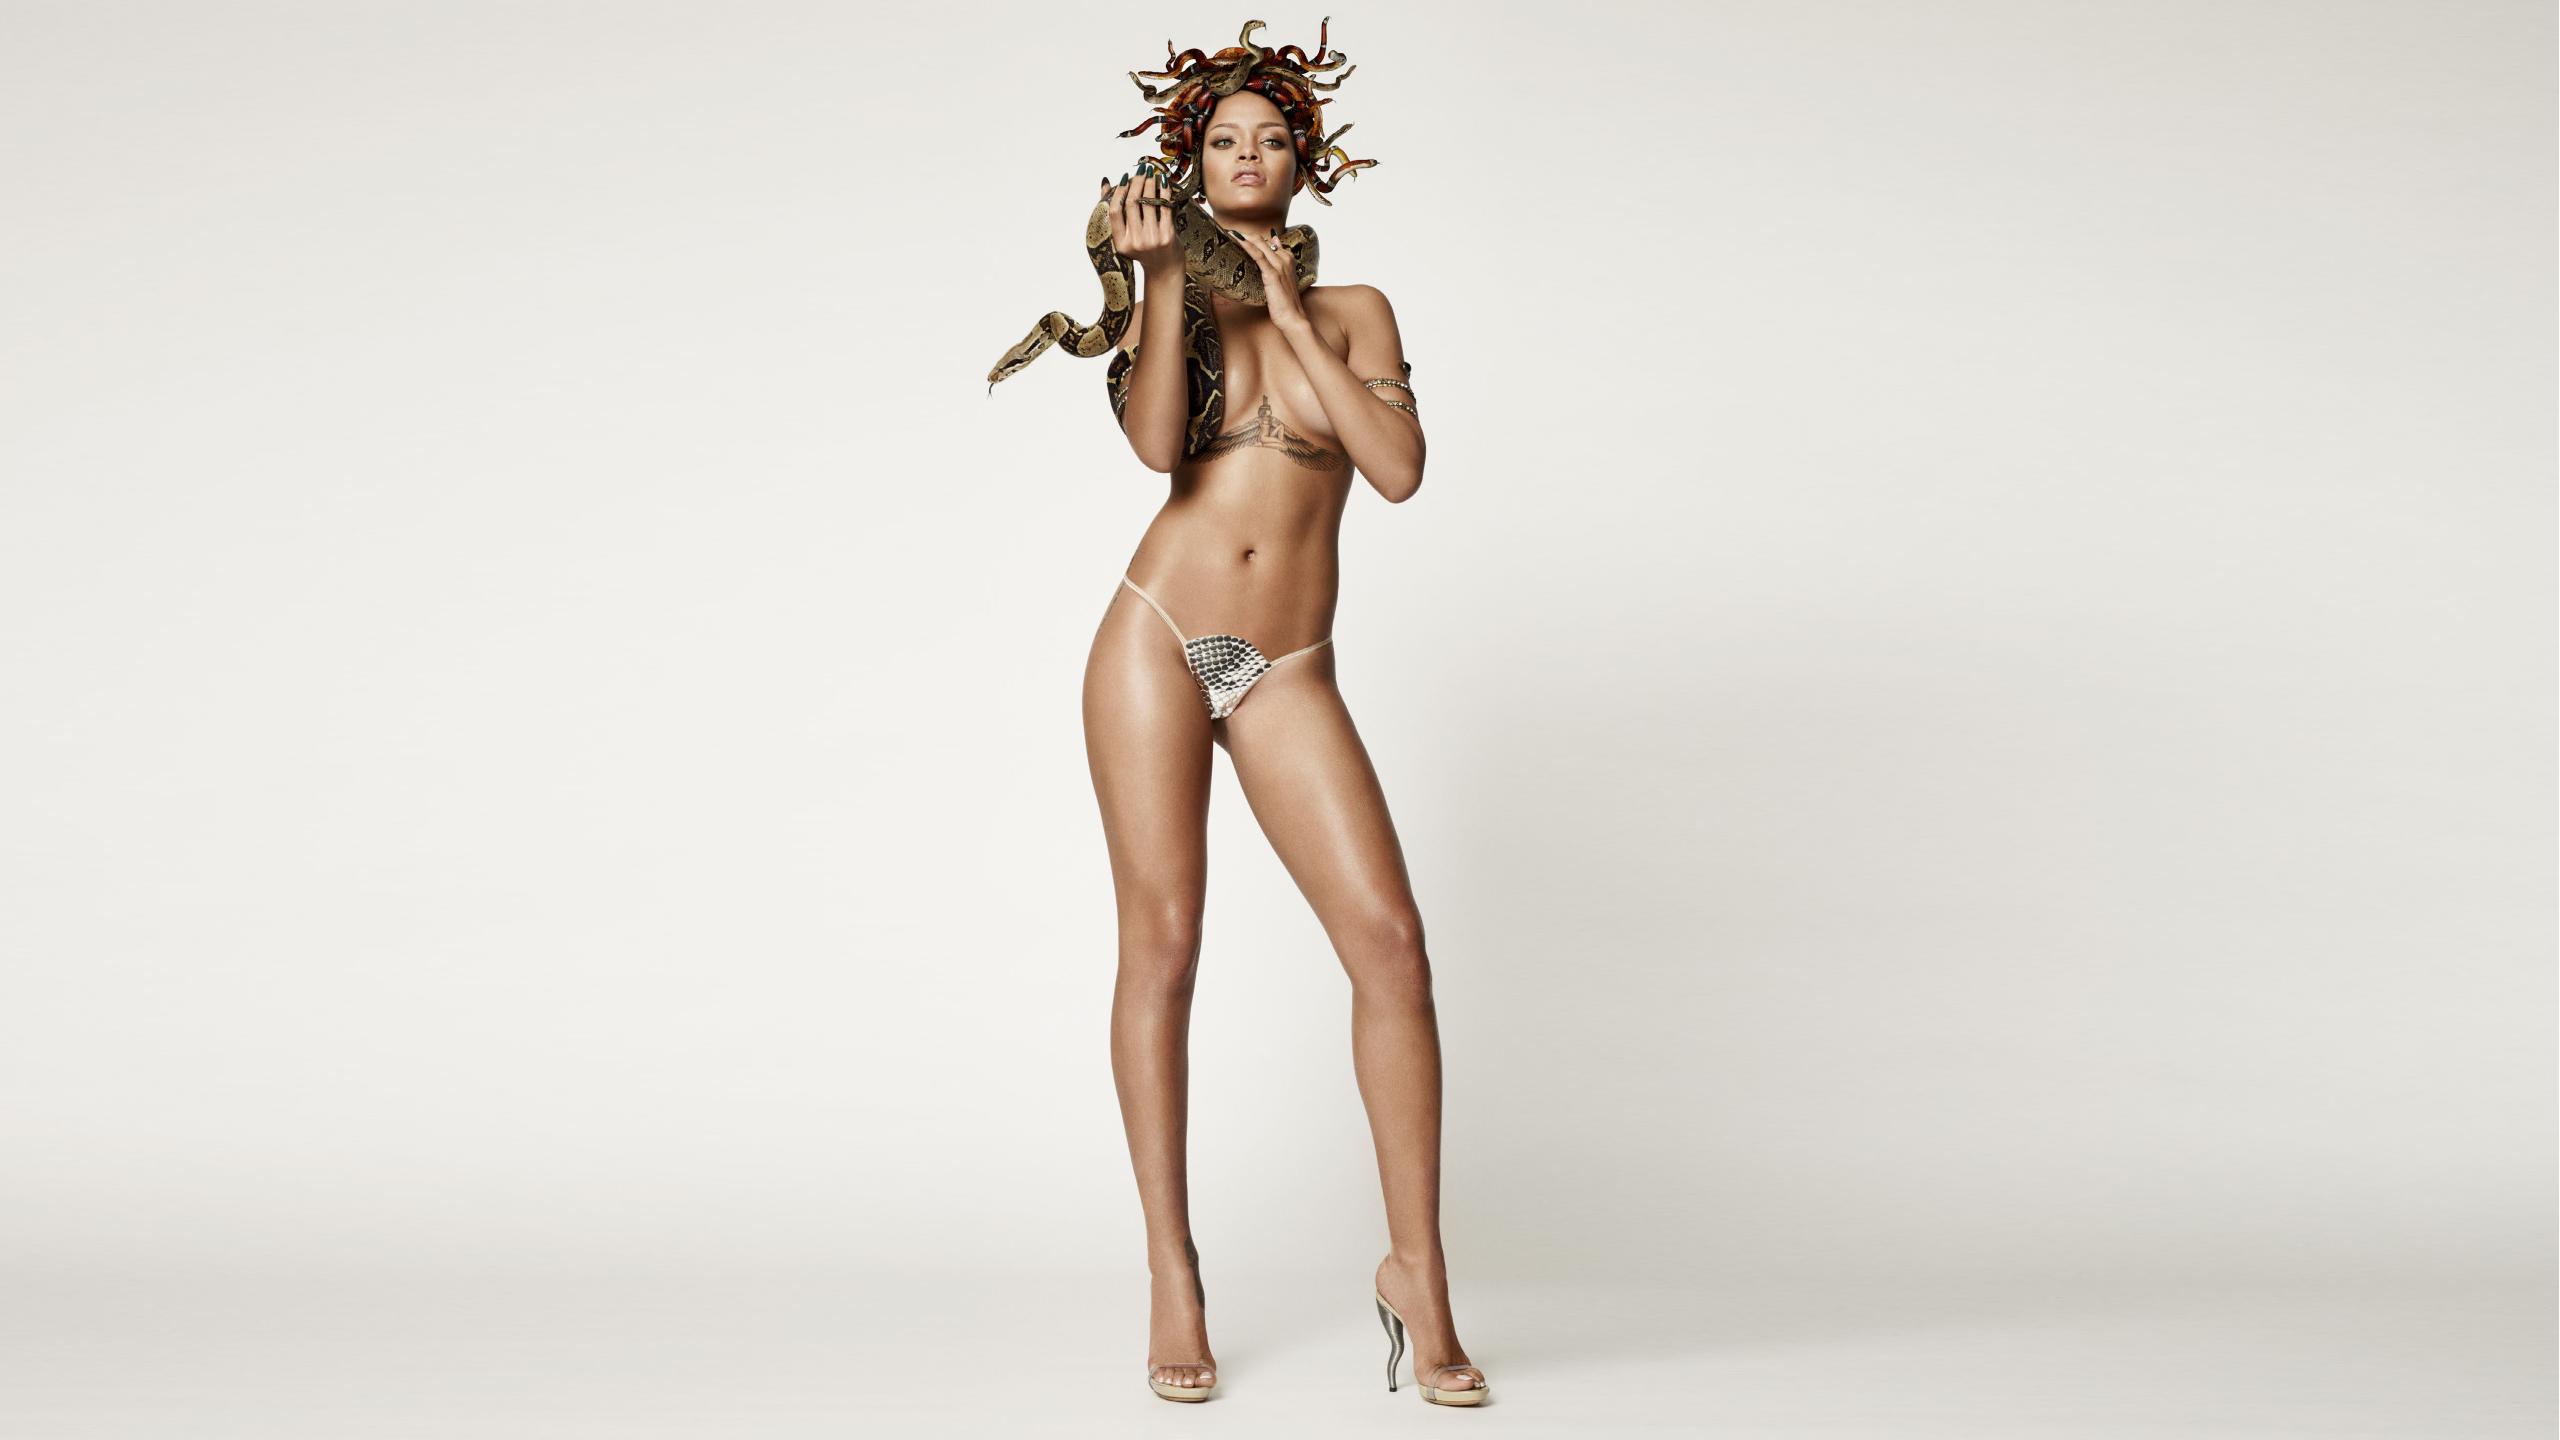 People 2560x1440 Rihanna women snake celebrity panties reptiles cleavage ebony